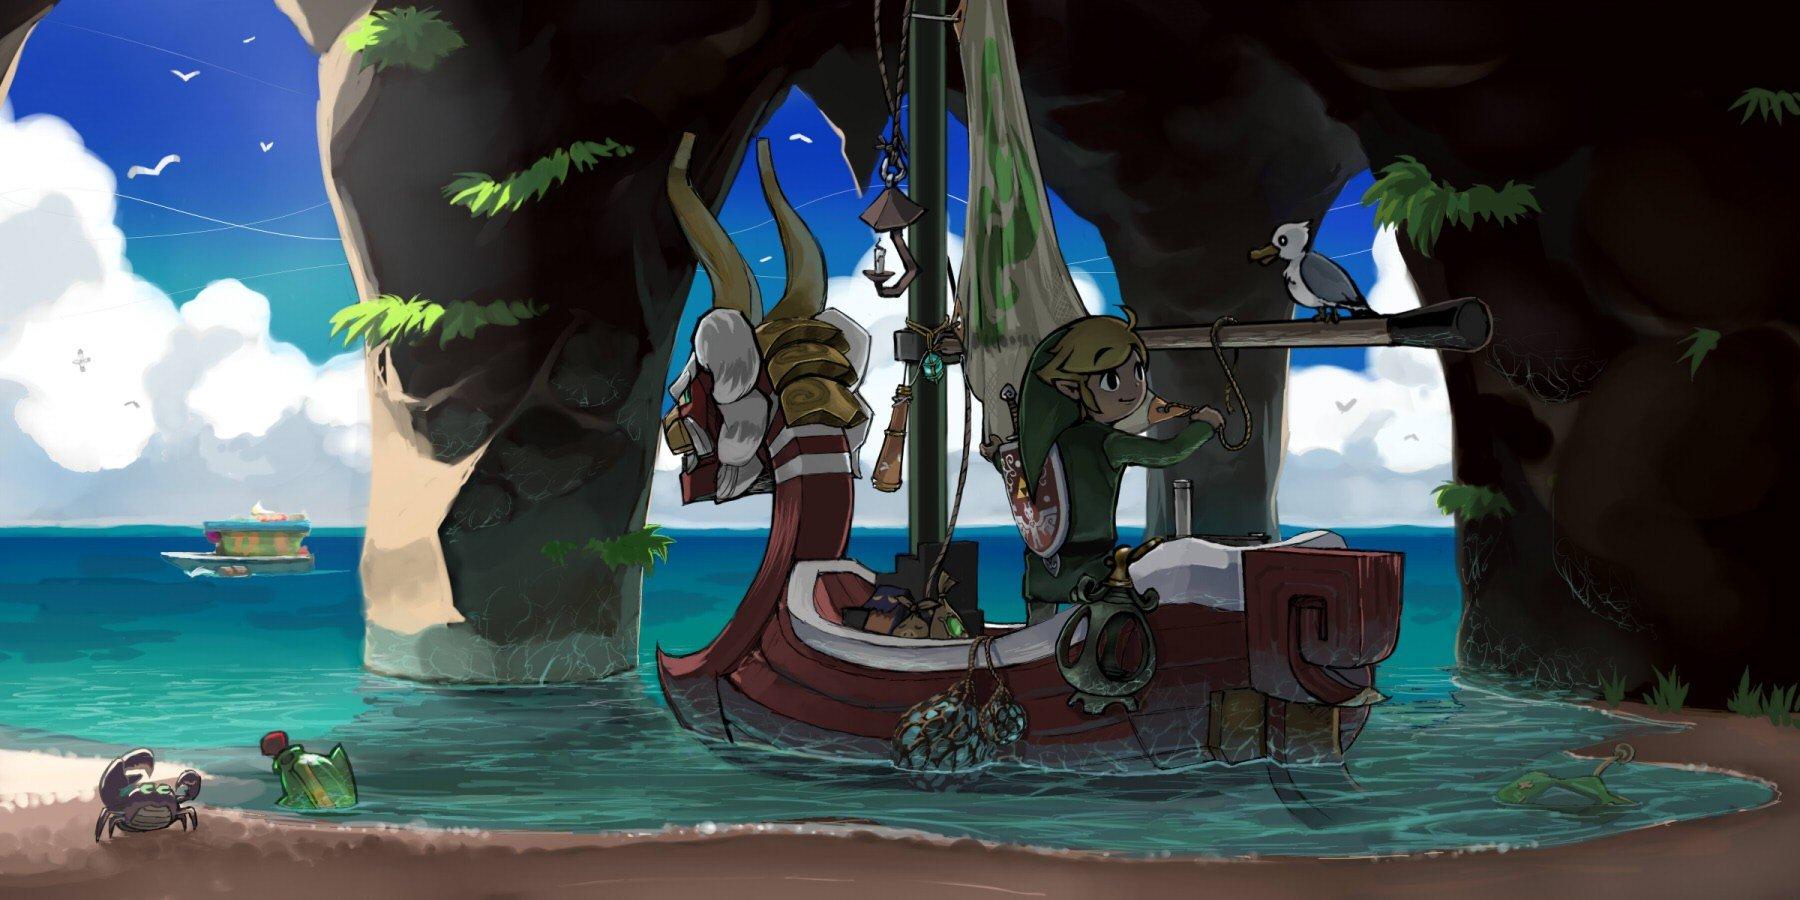 boats crabs The Legend of Zelda The Wind Waker wallpaper background 1800x900